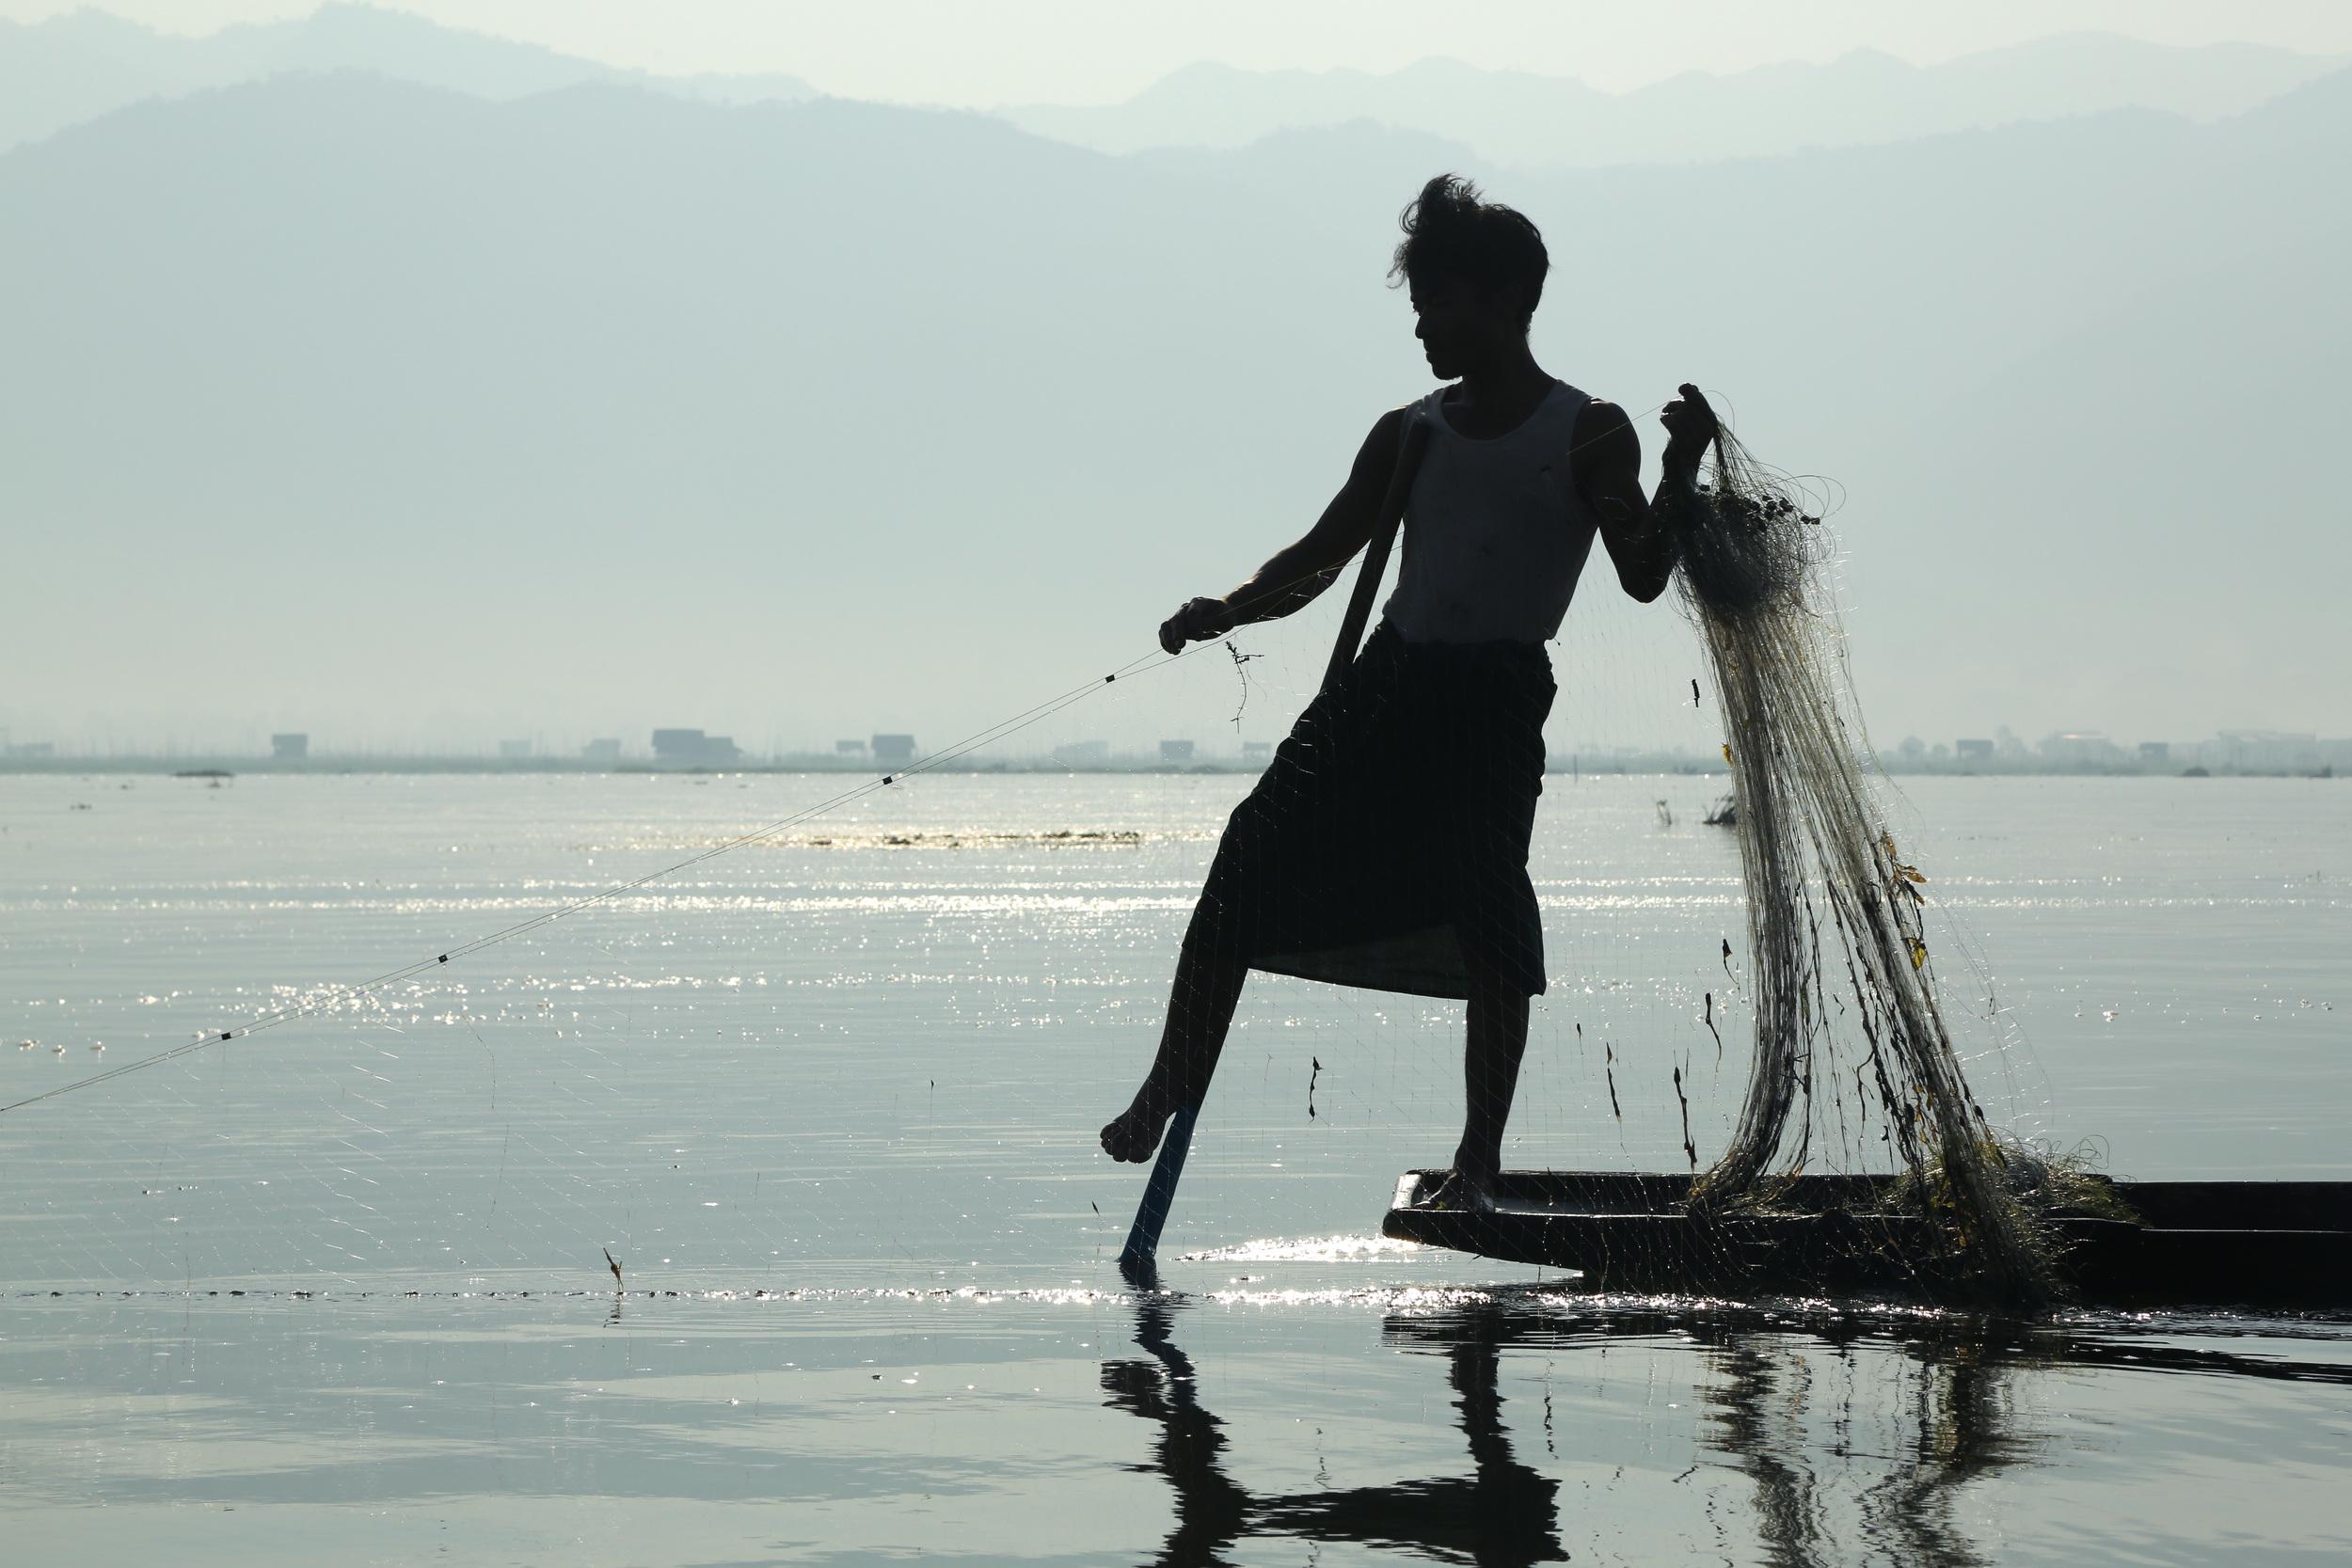 fisherman_profile.jpg